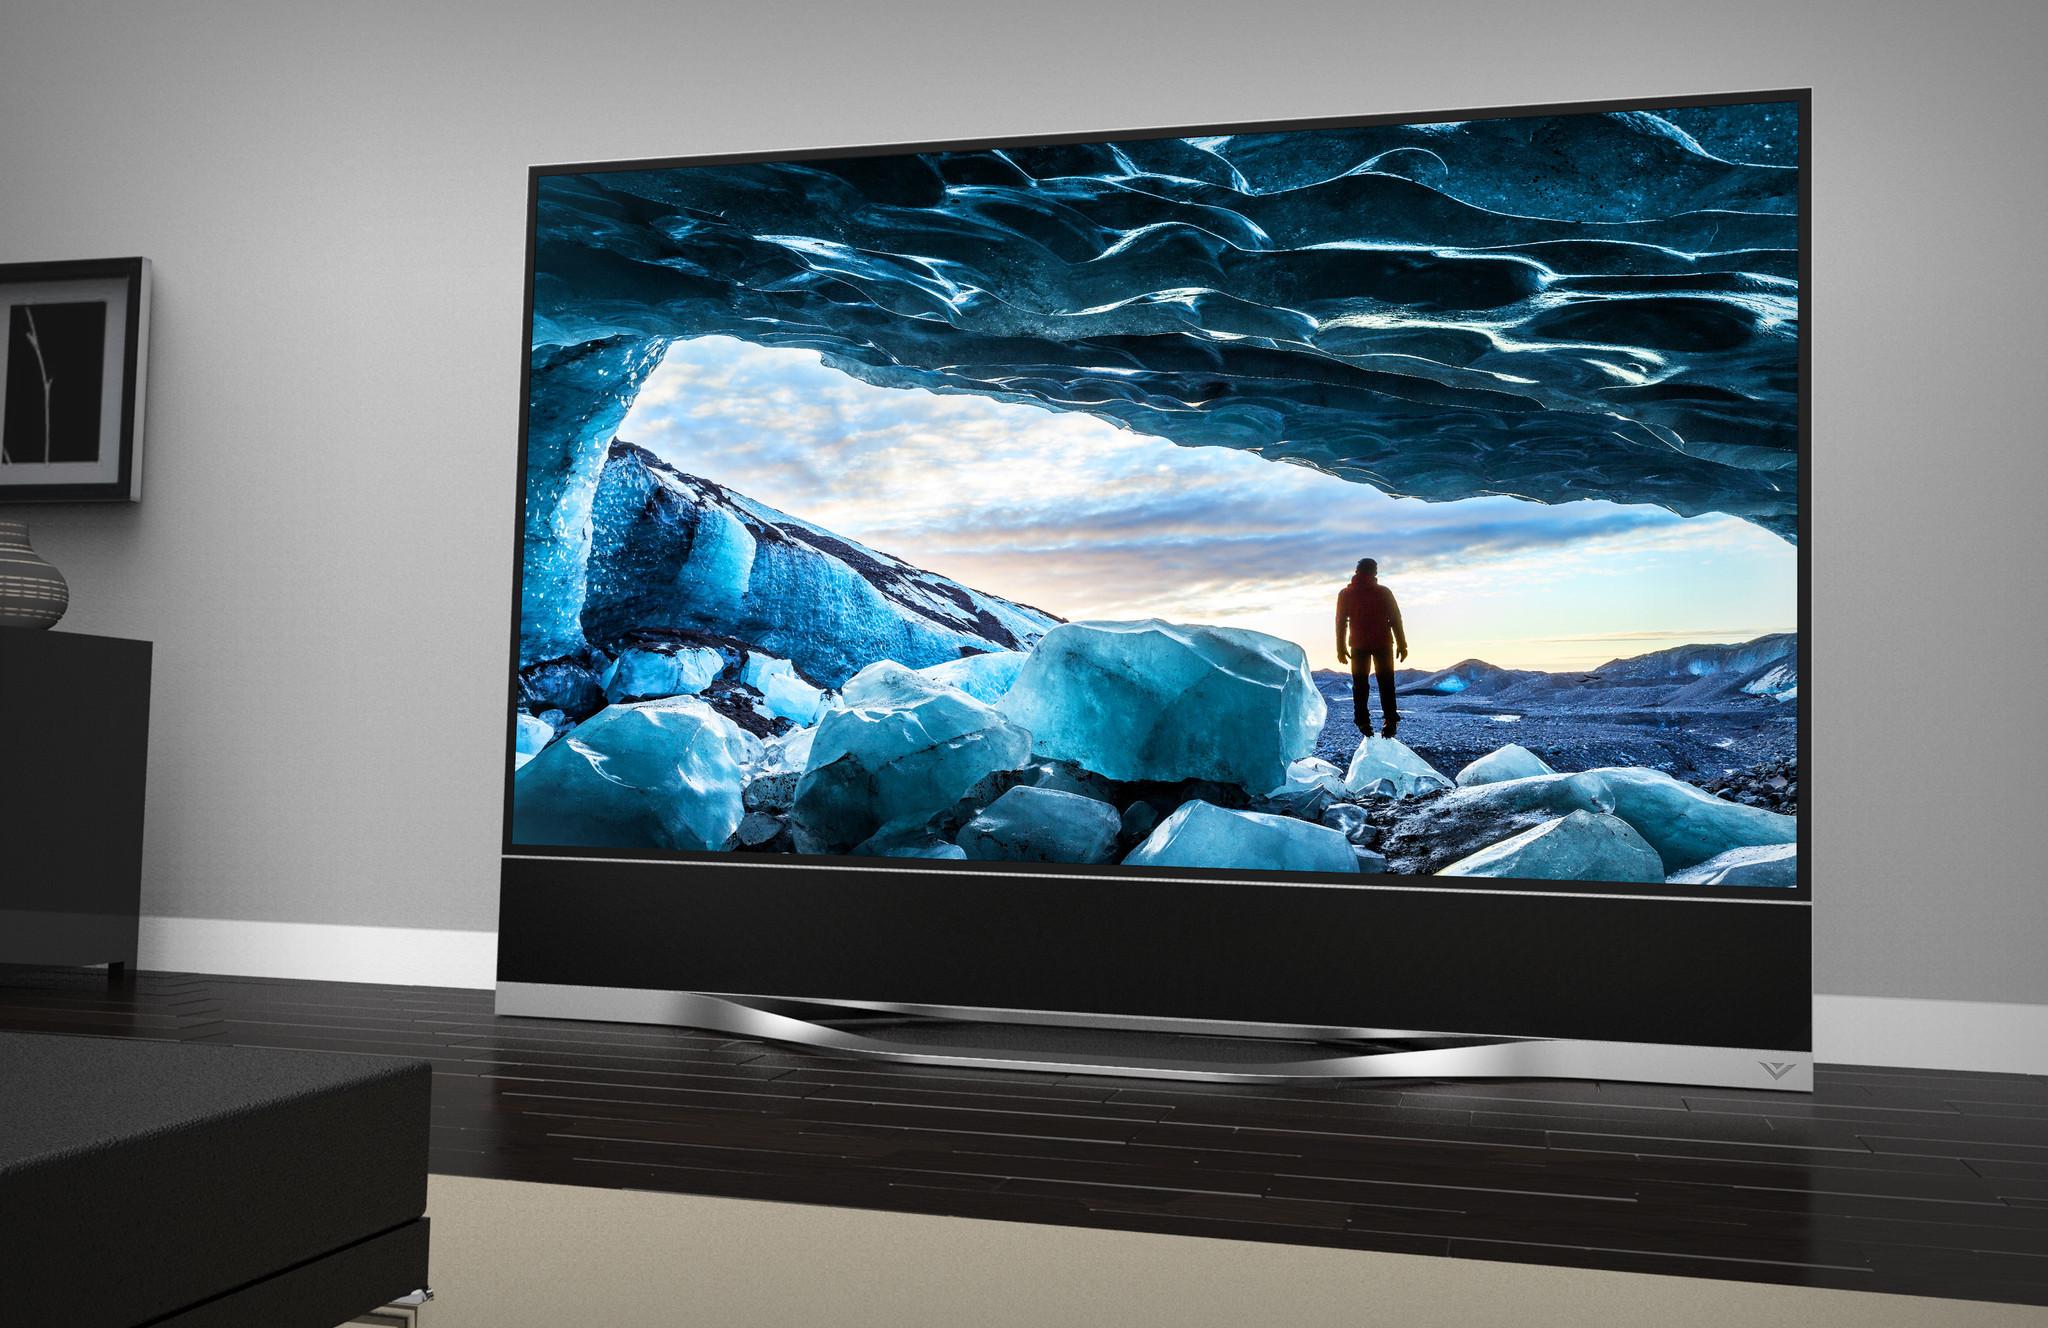 ces 2014 vizio announces 120 inch ultra hd tv la times. Black Bedroom Furniture Sets. Home Design Ideas